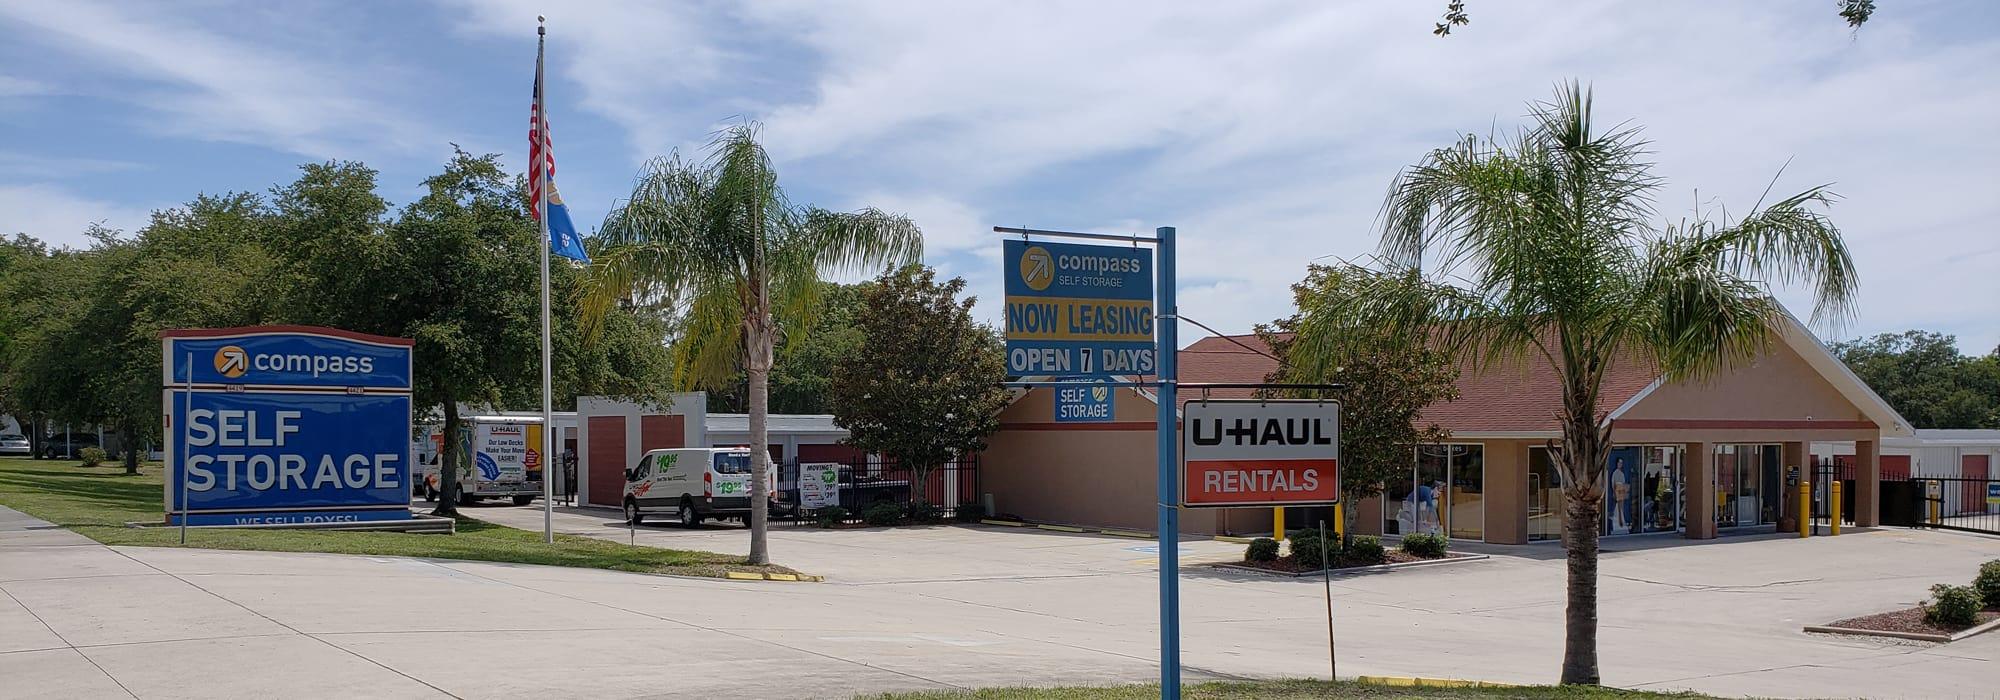 Ordinaire Self Storage In New Port Richey FL